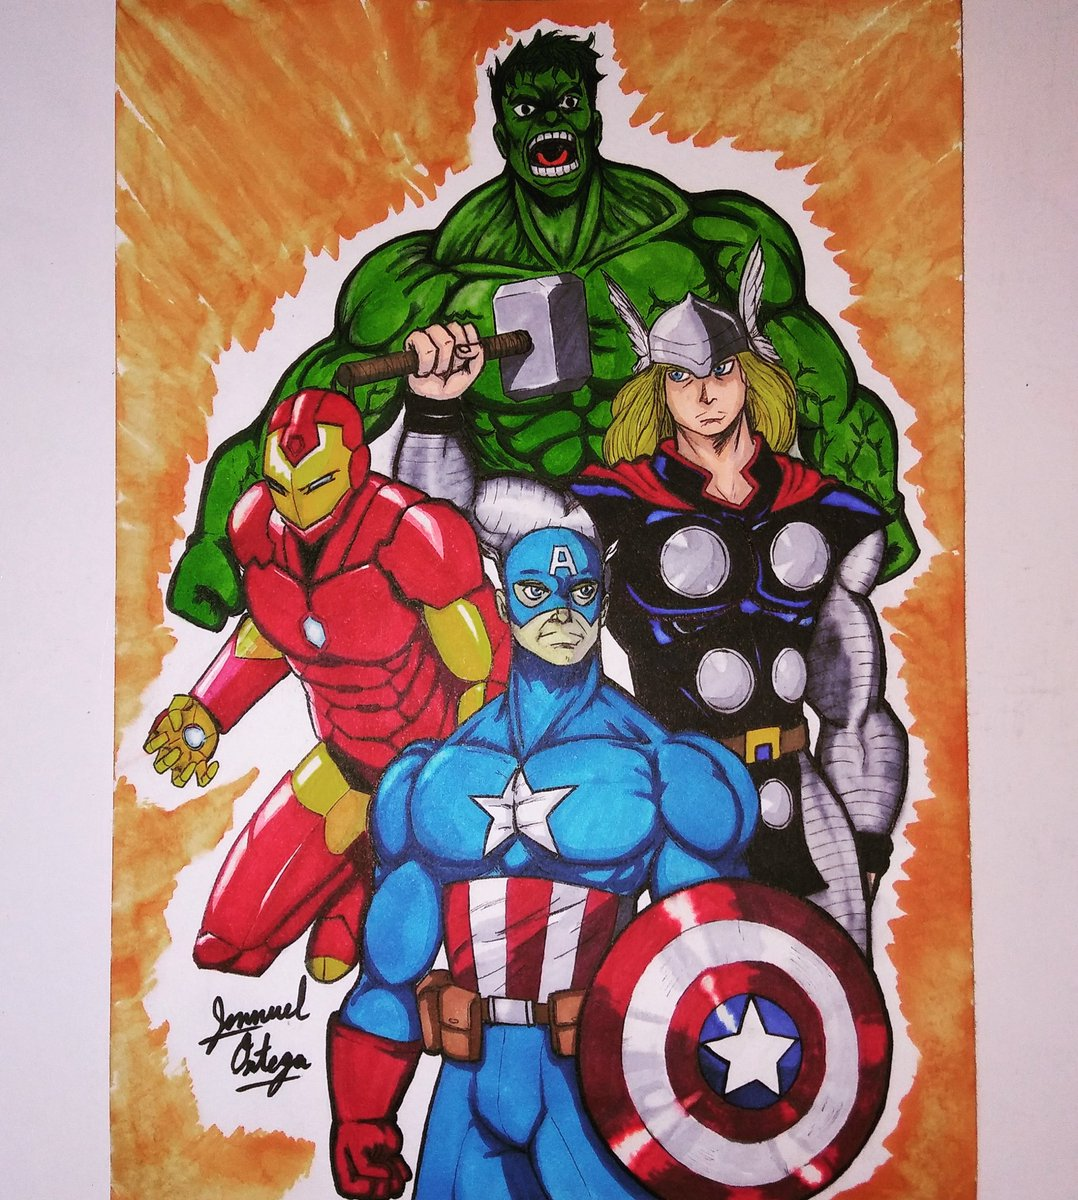 Avengers assemble! #captainamerica #hulk #thor #ironman #marvelcomics<br>http://pic.twitter.com/tqLy79H7Cx